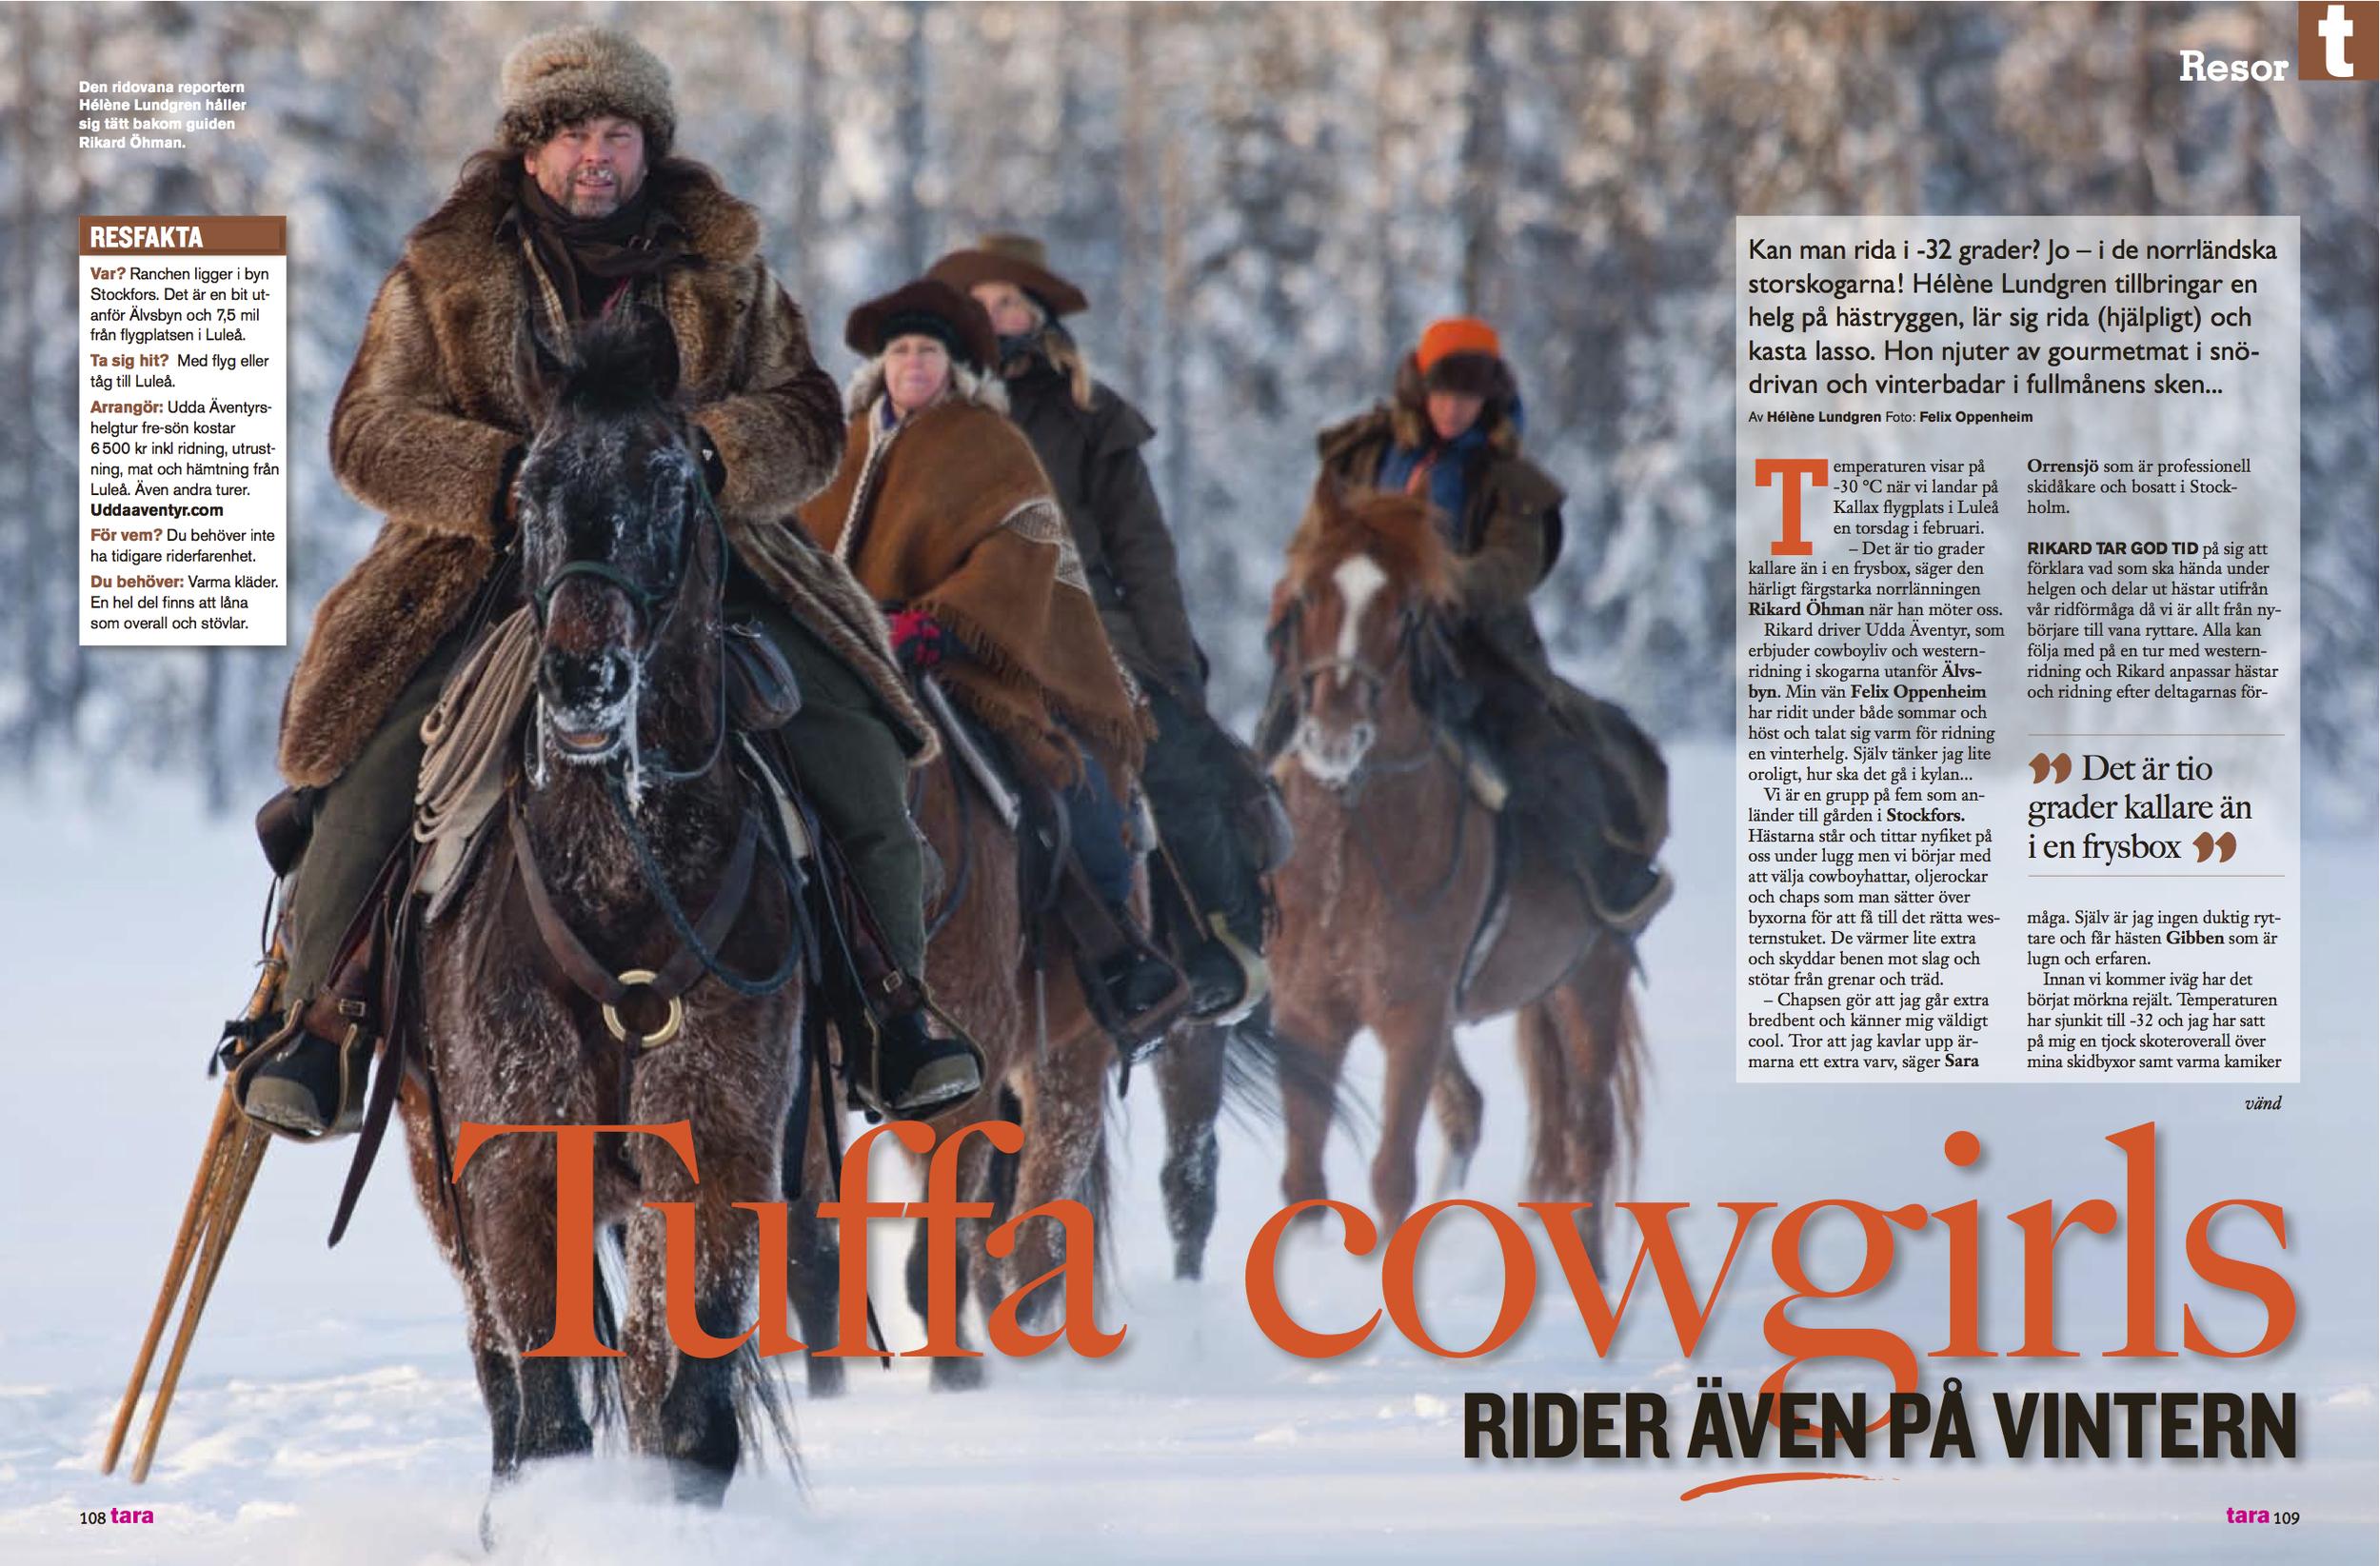 Tara Cowgirls 2-12 1.jpg